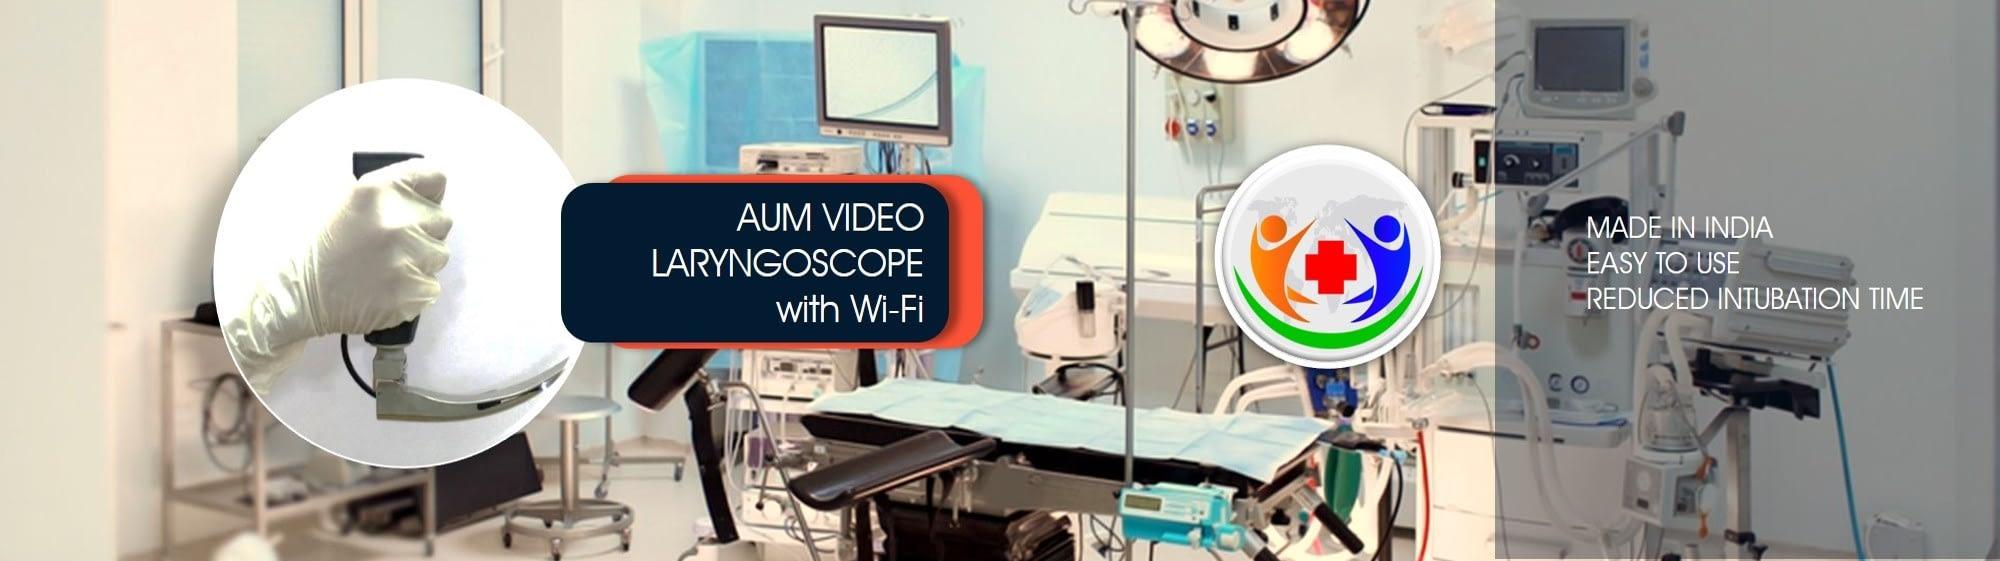 wifi video laryngoscope perfect solution